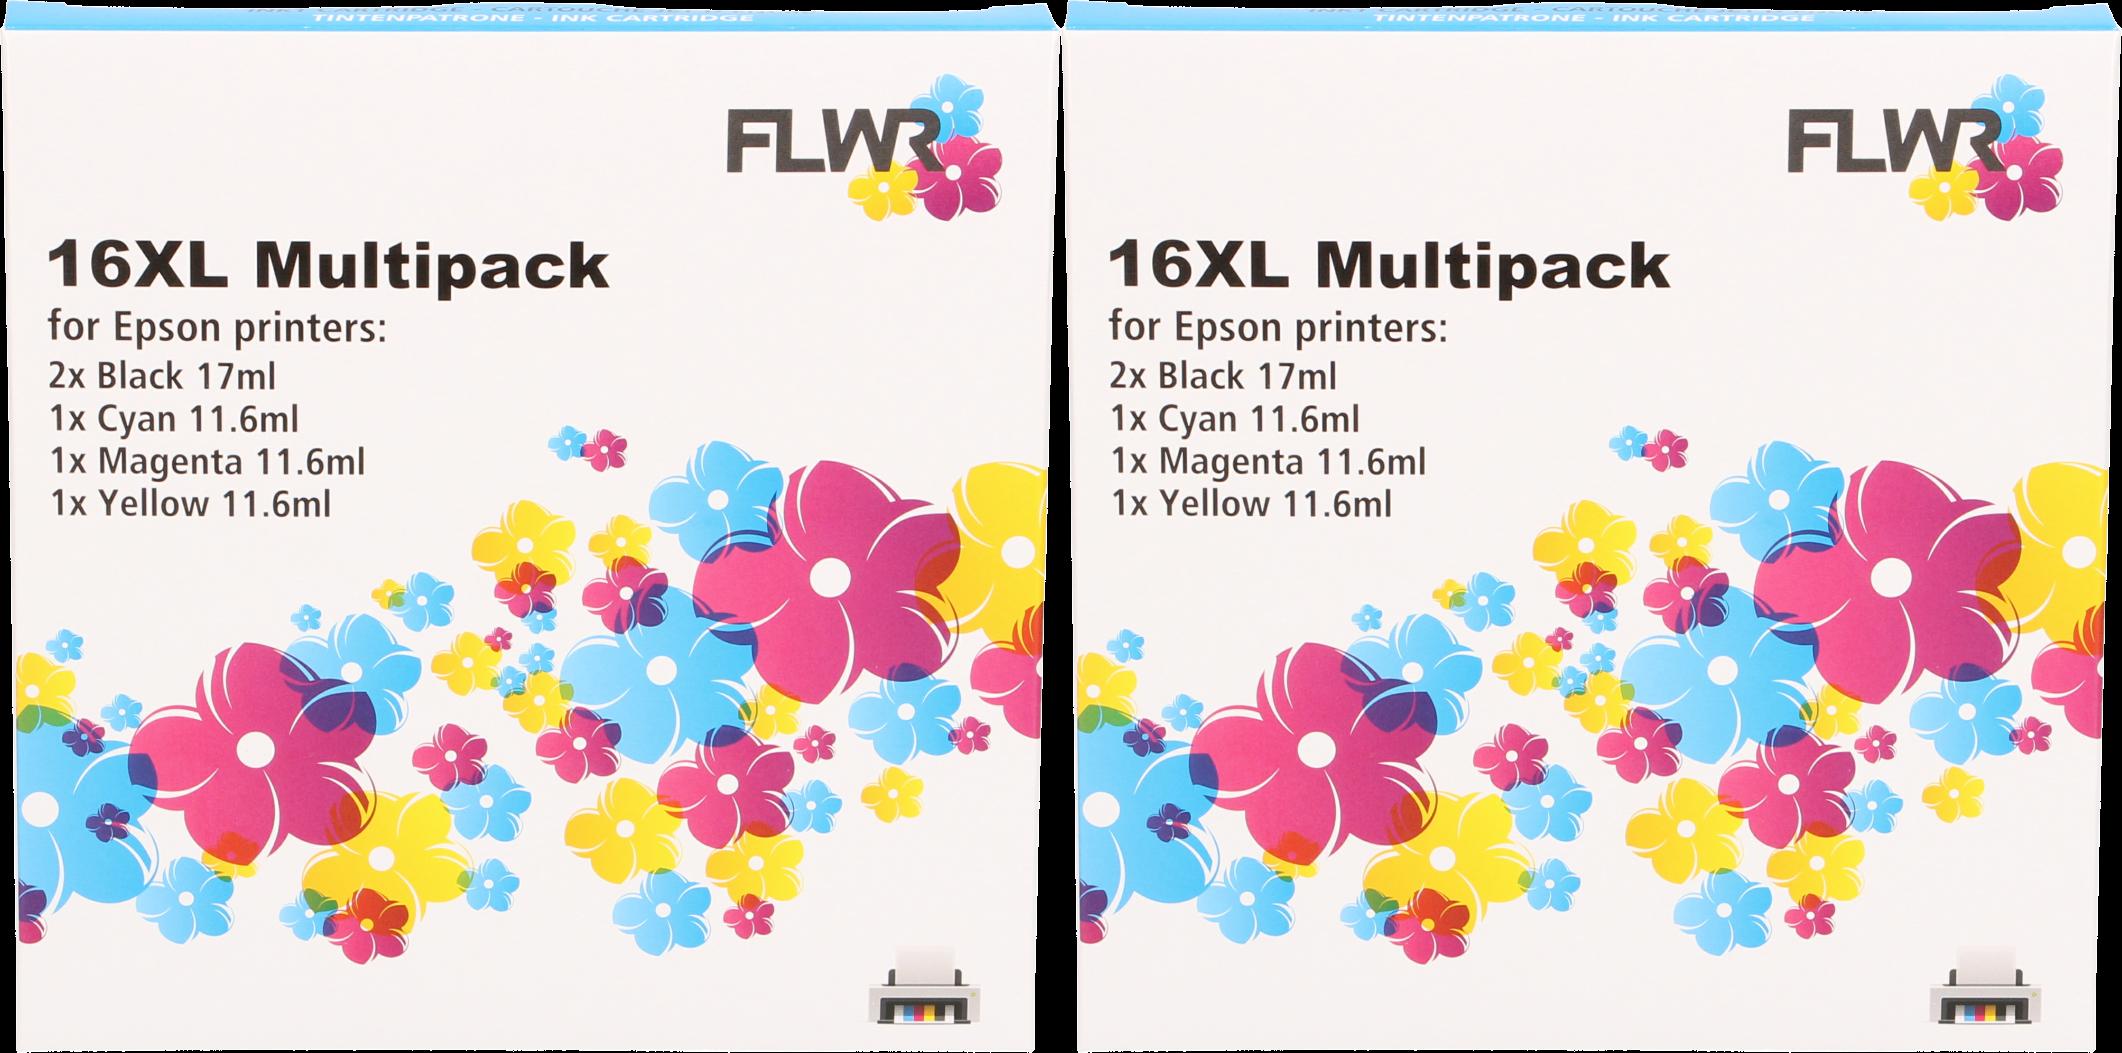 FLWR Epson 16XL Multipack (2 sets) zwart en kleur